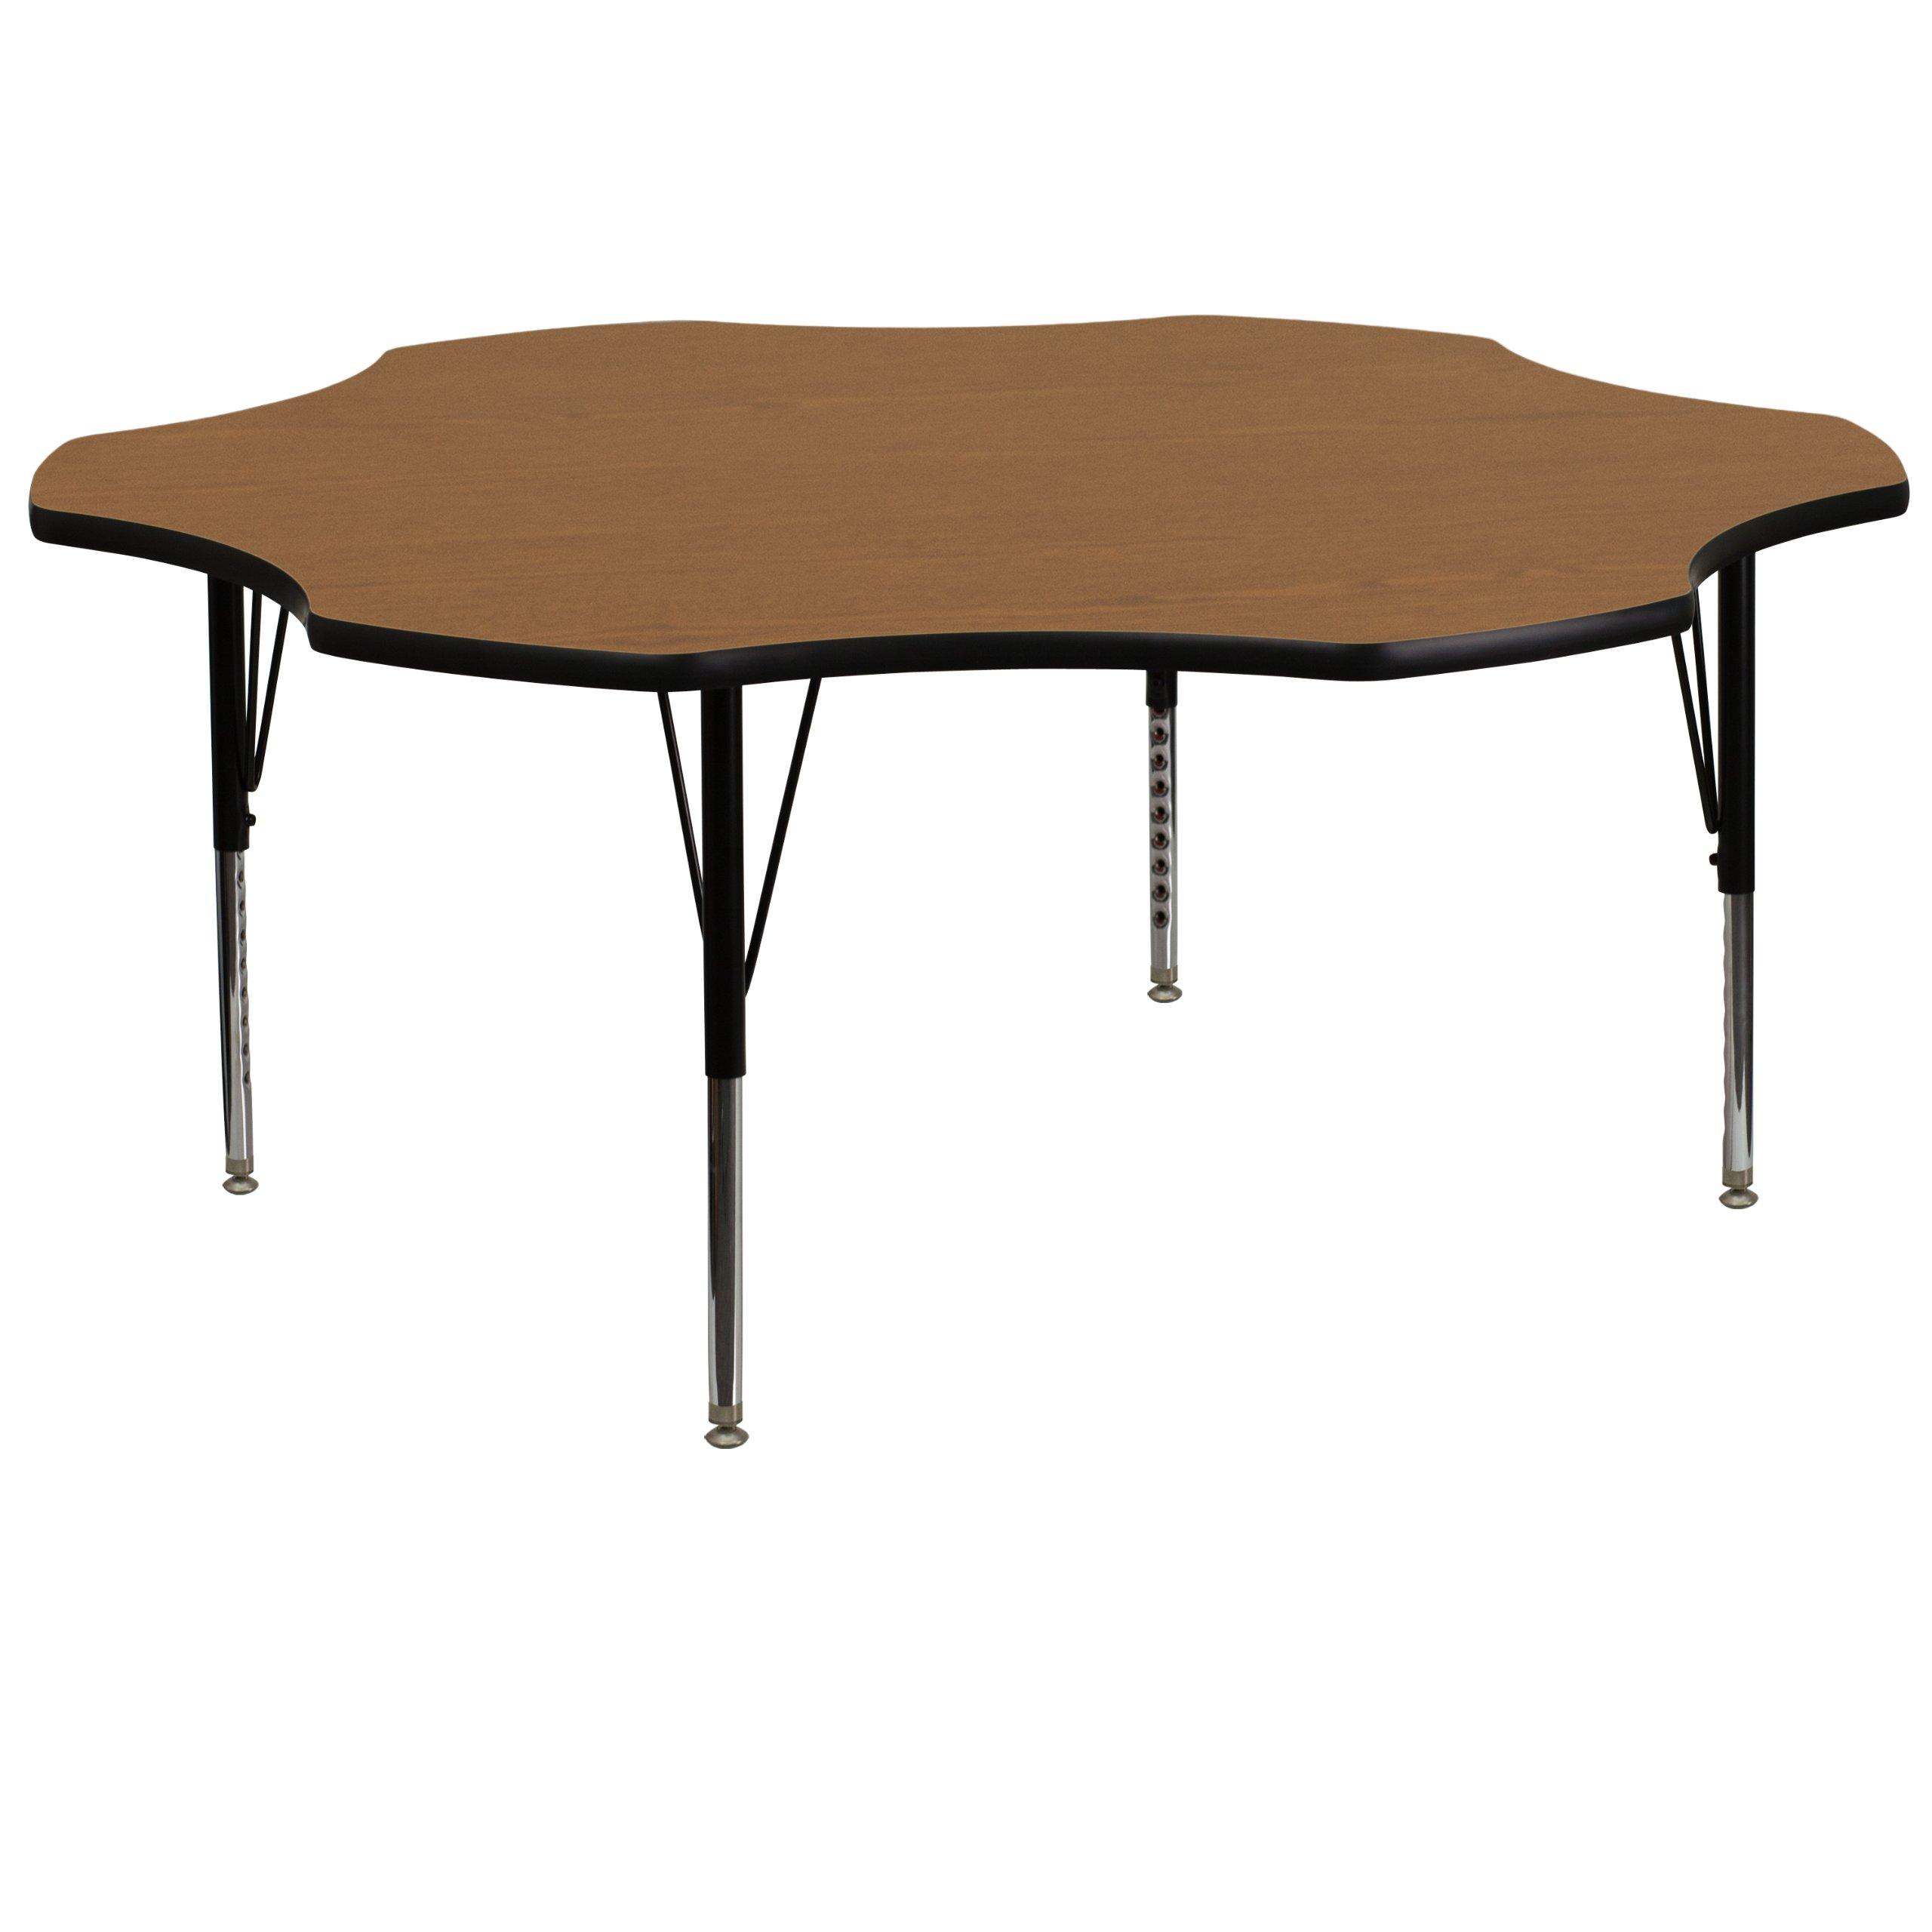 Flash Furniture 60'' Flower Oak Thermal Laminate Activity Table - Height Adjustable Short Legs